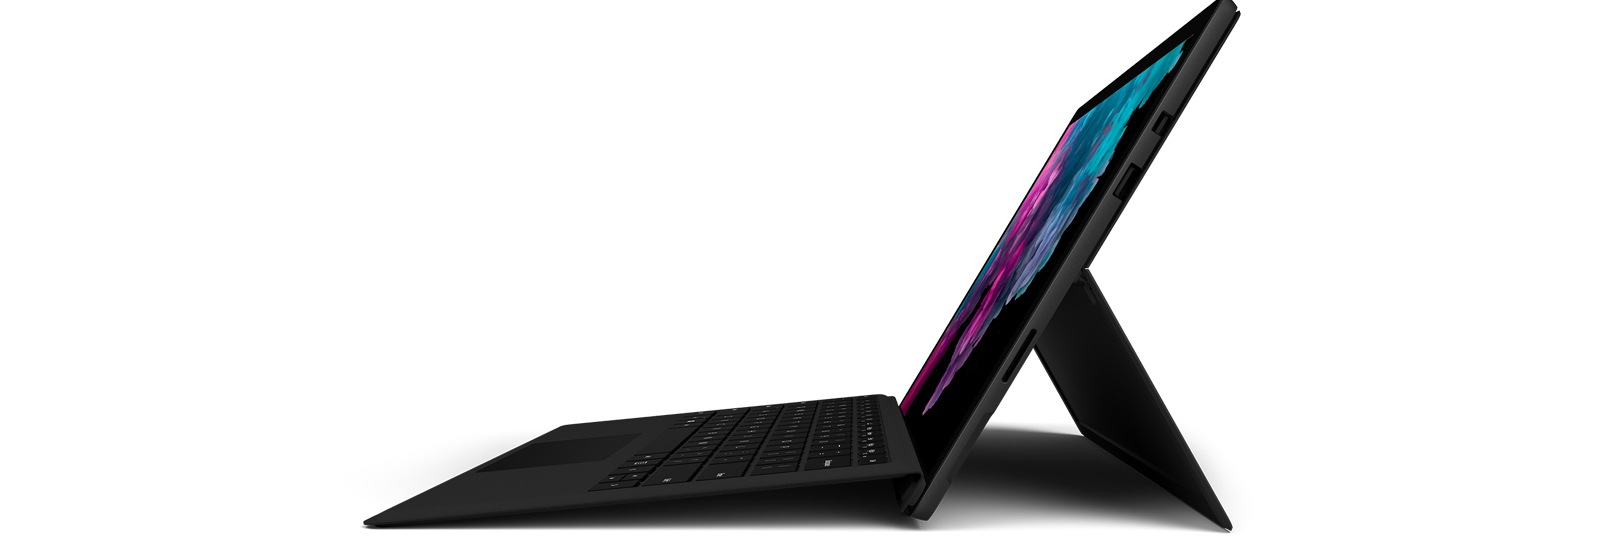 Surface Pro 6 側視圖